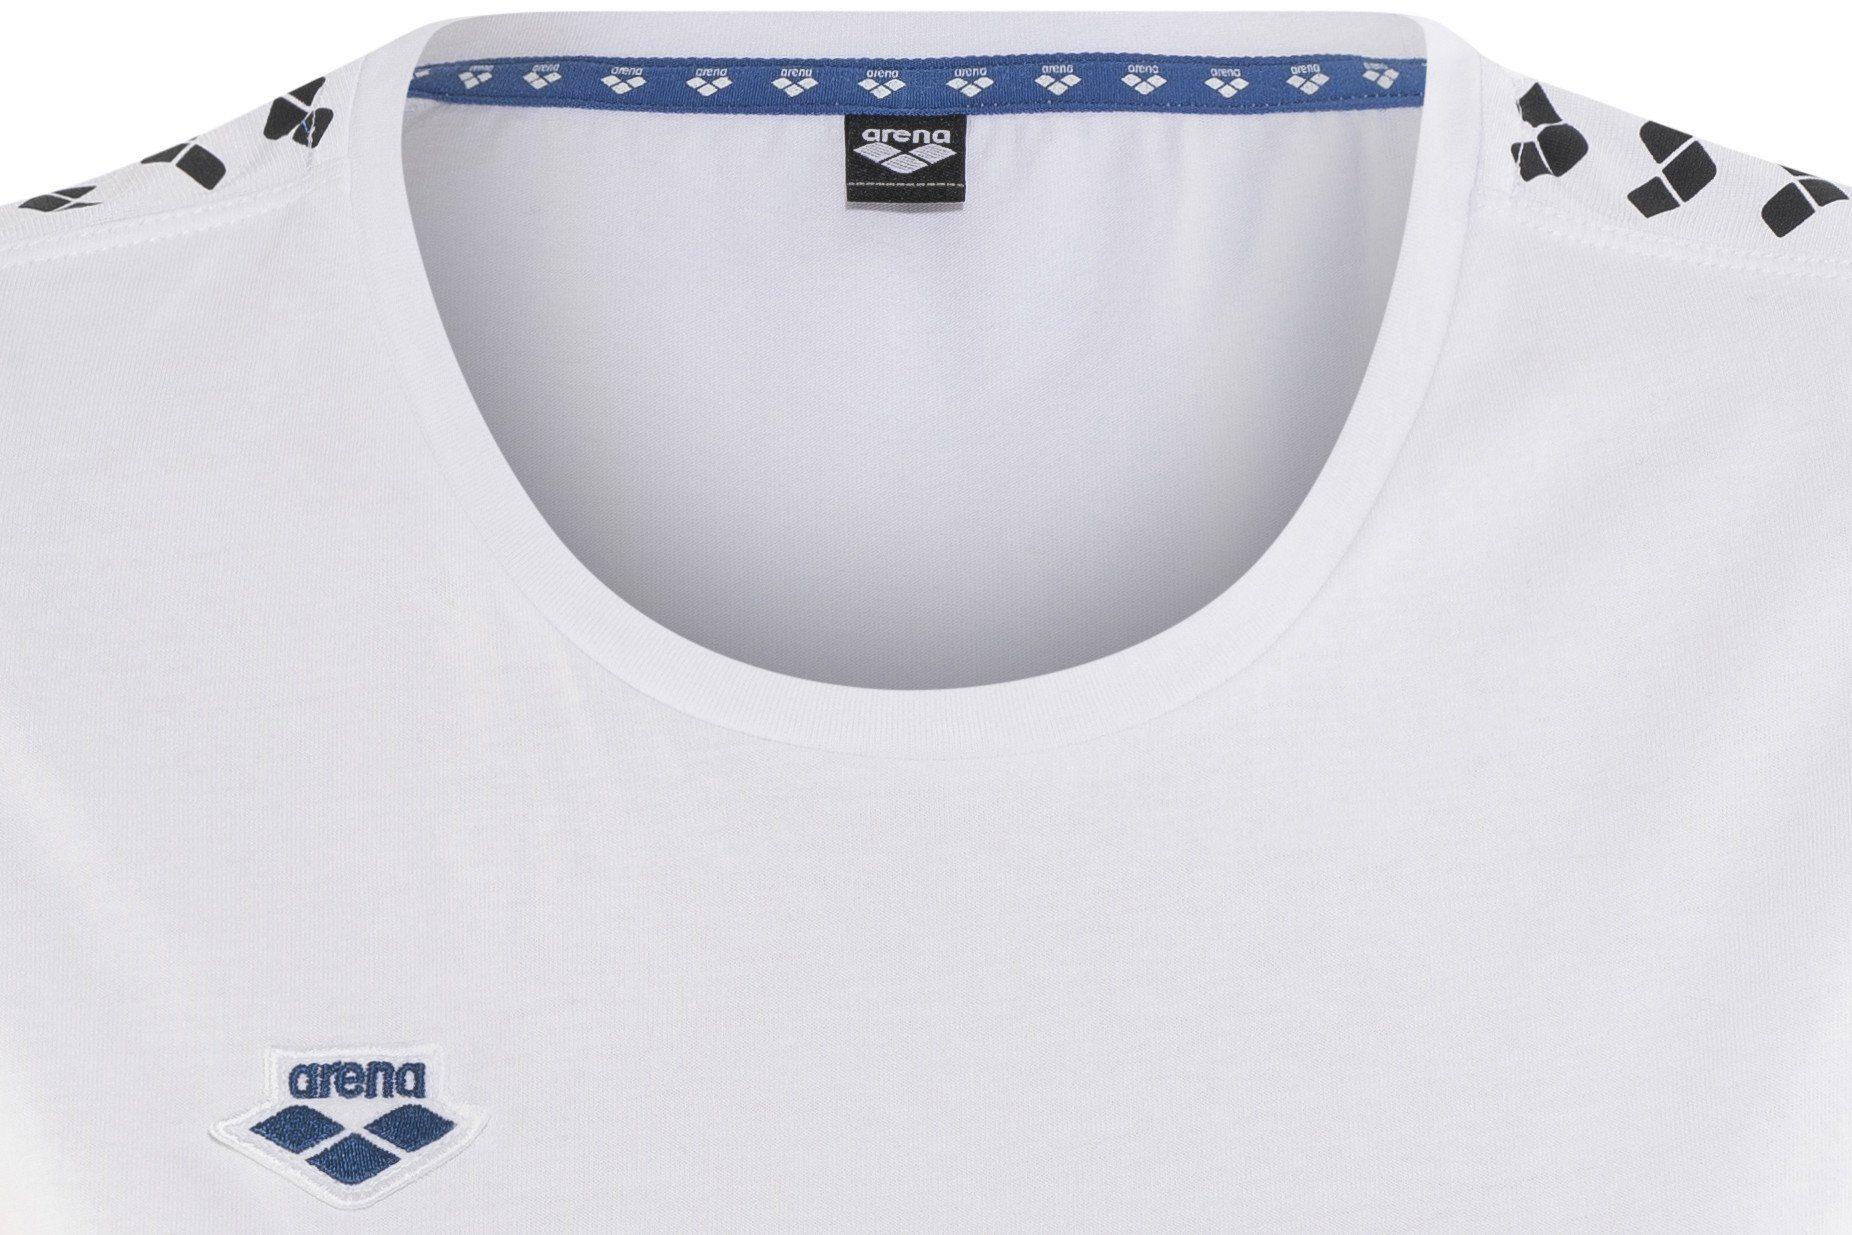 Online Kaufen shirt Arena Damen« T »team hxQdtsrC